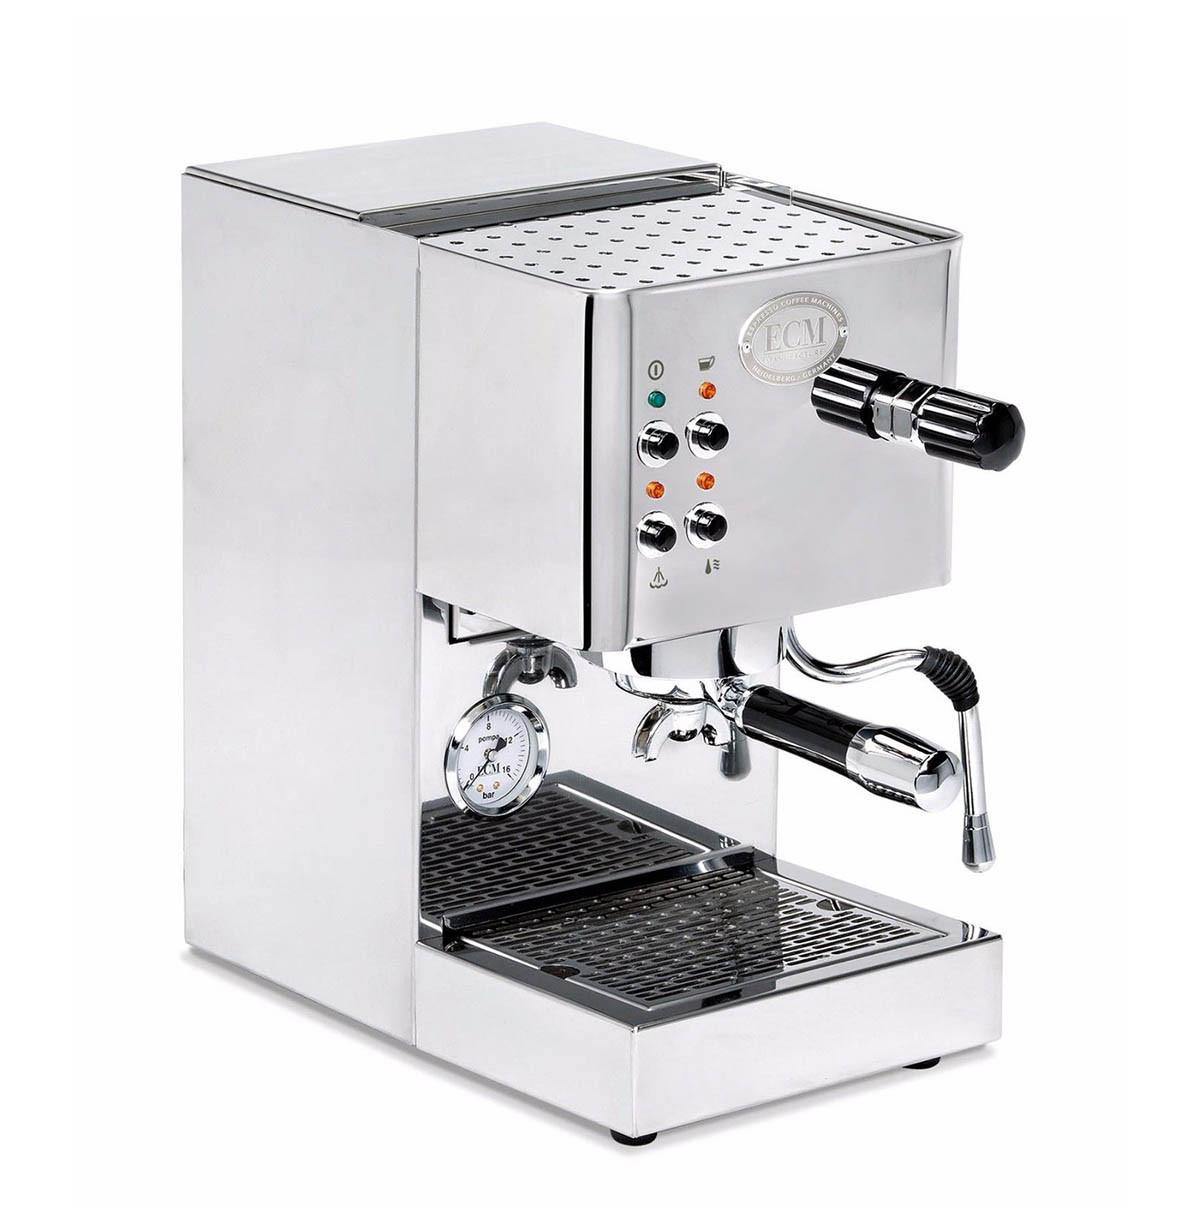 ECM Einkreislauf Casa V Espressomaschine